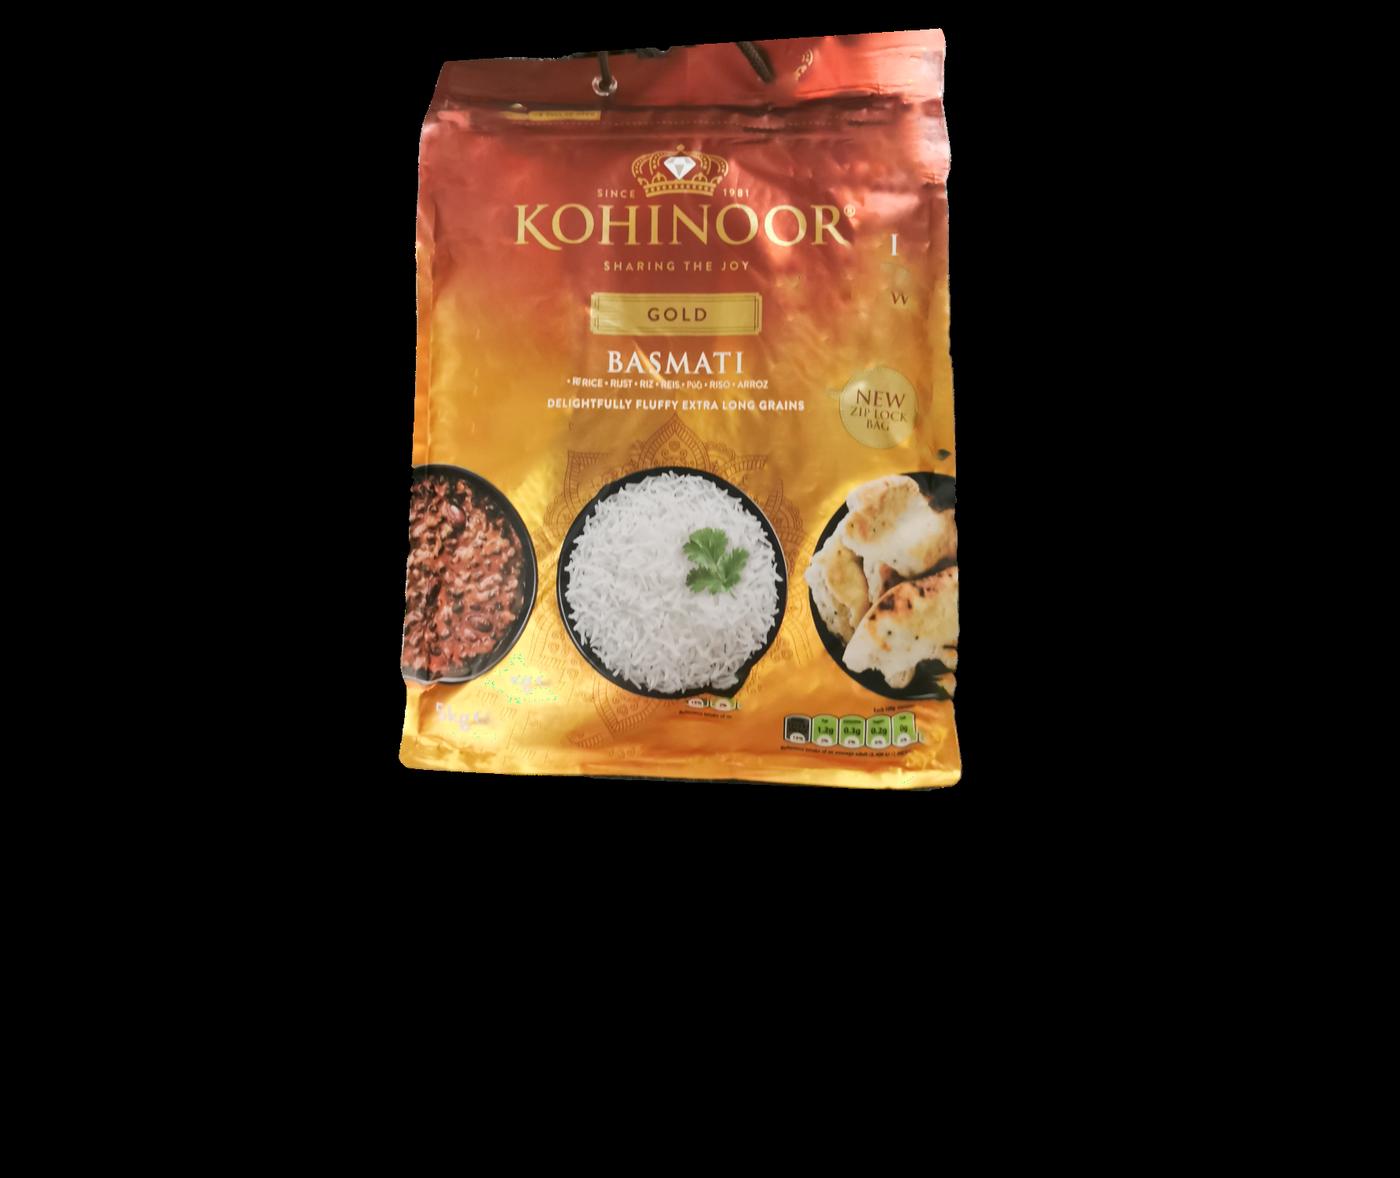 Kohinoor Gold Basmati